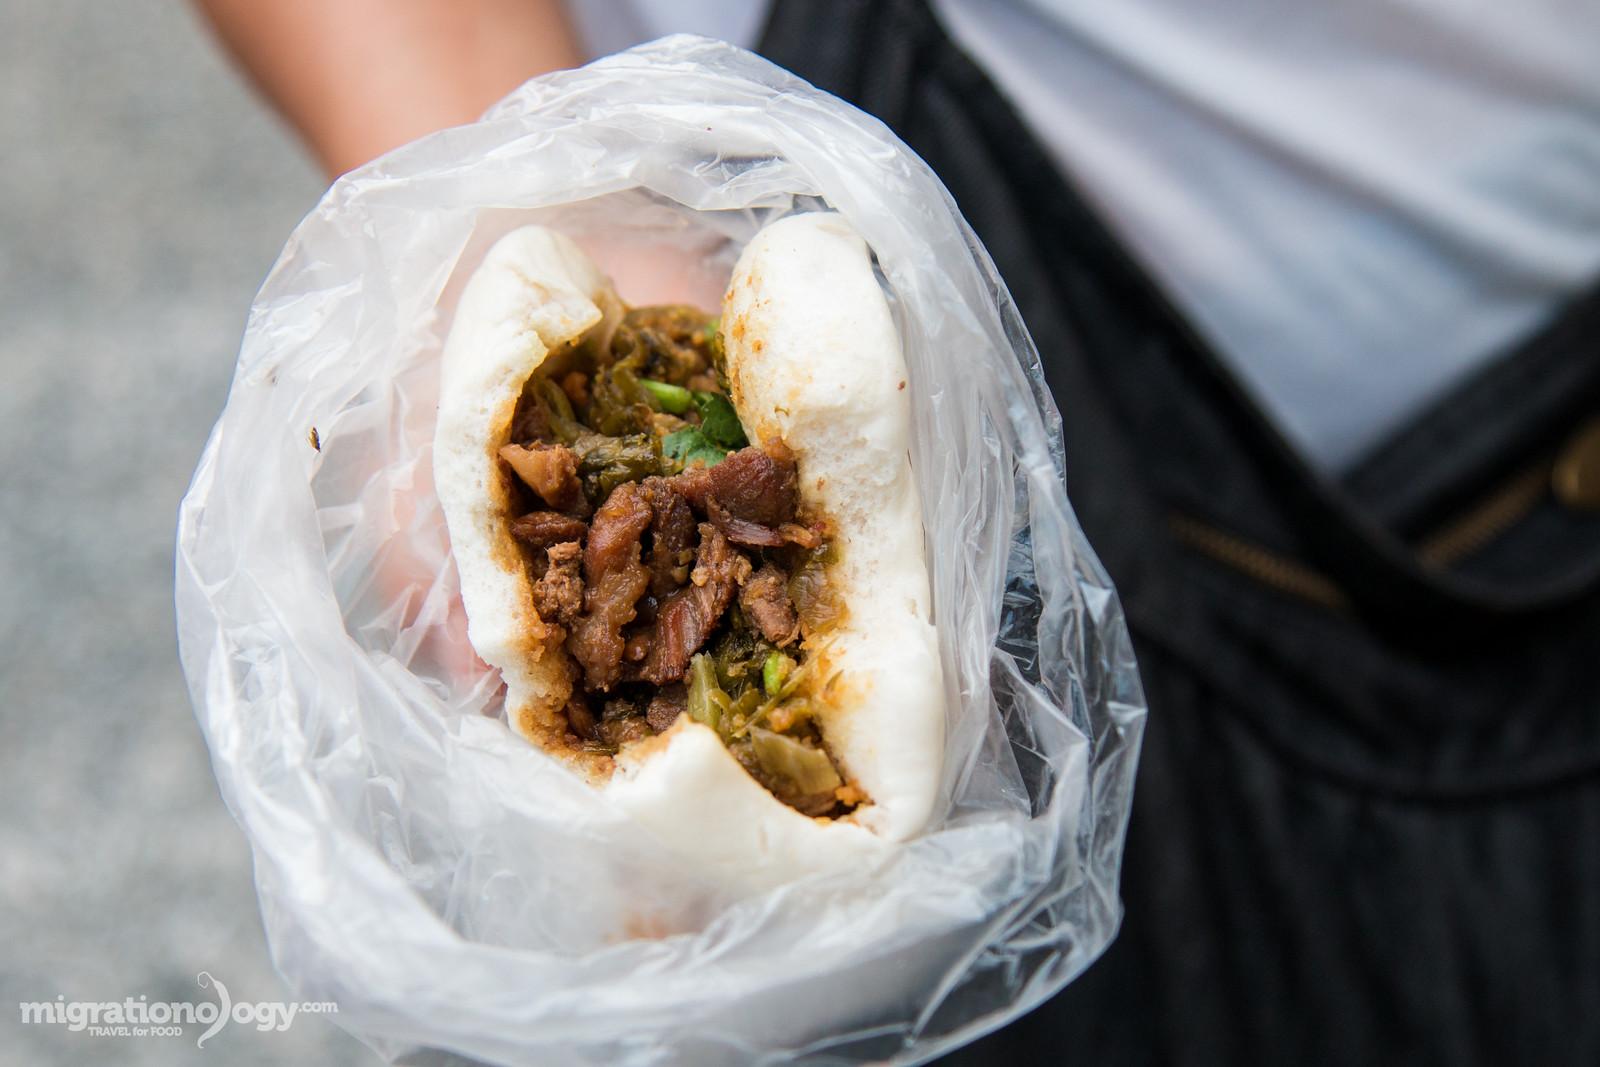 Taiwanese Food - Taiwanese sandwich (割包)